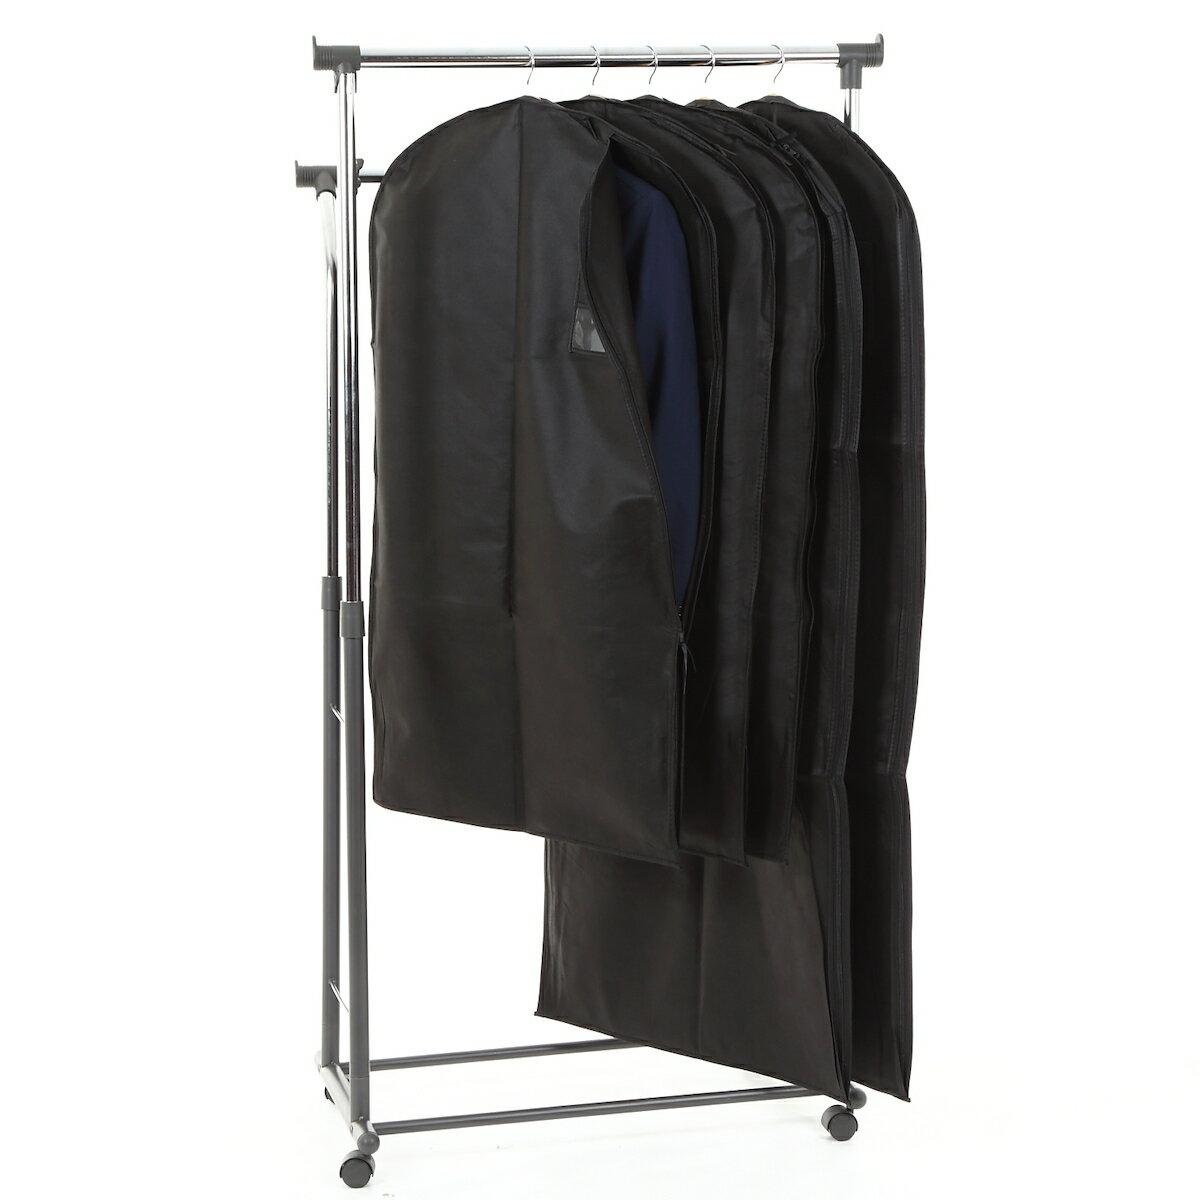 RATOM 洋服カバー